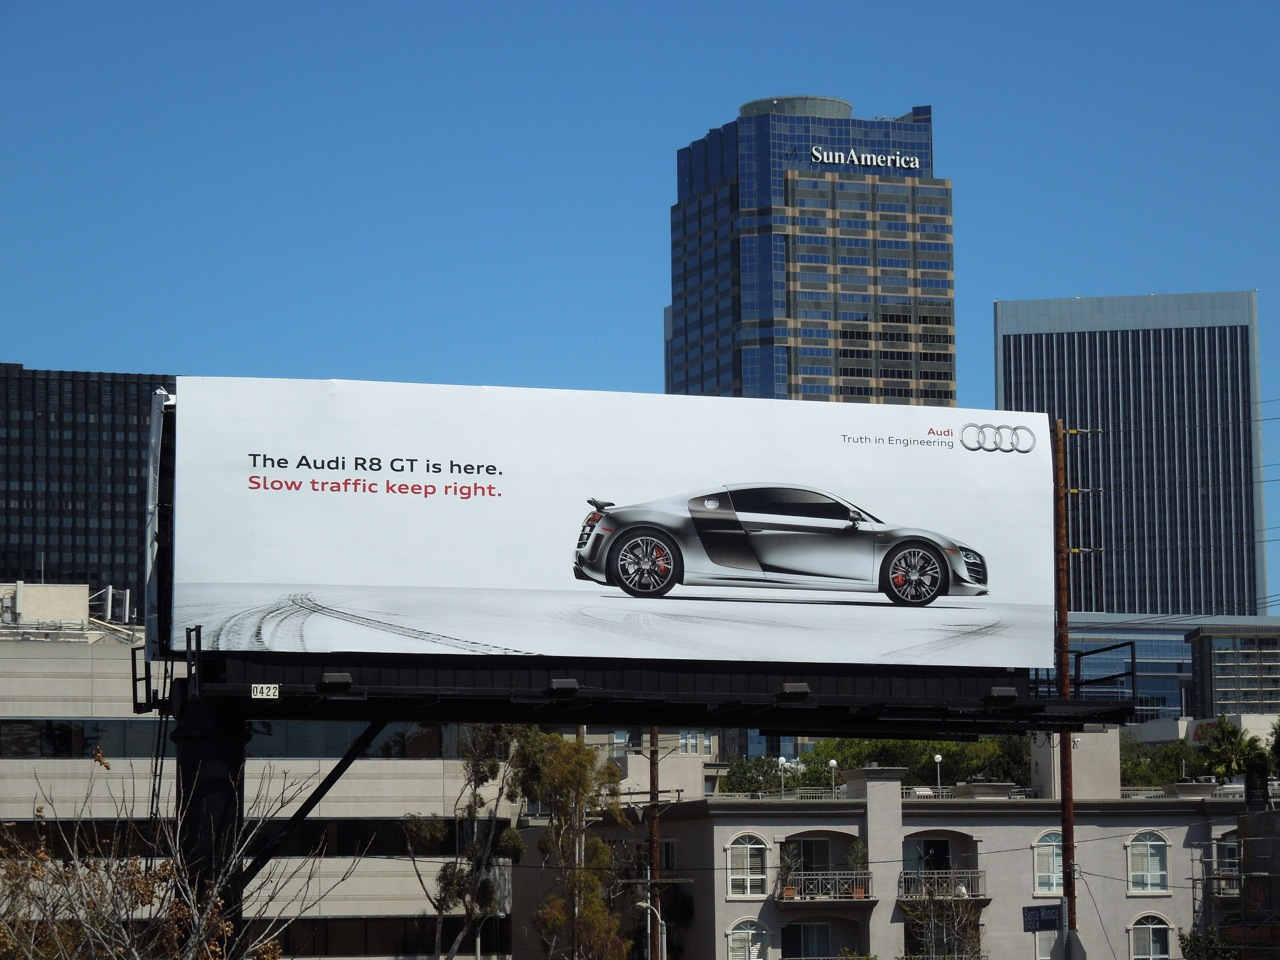 Audi R8 Gt Car Billboard